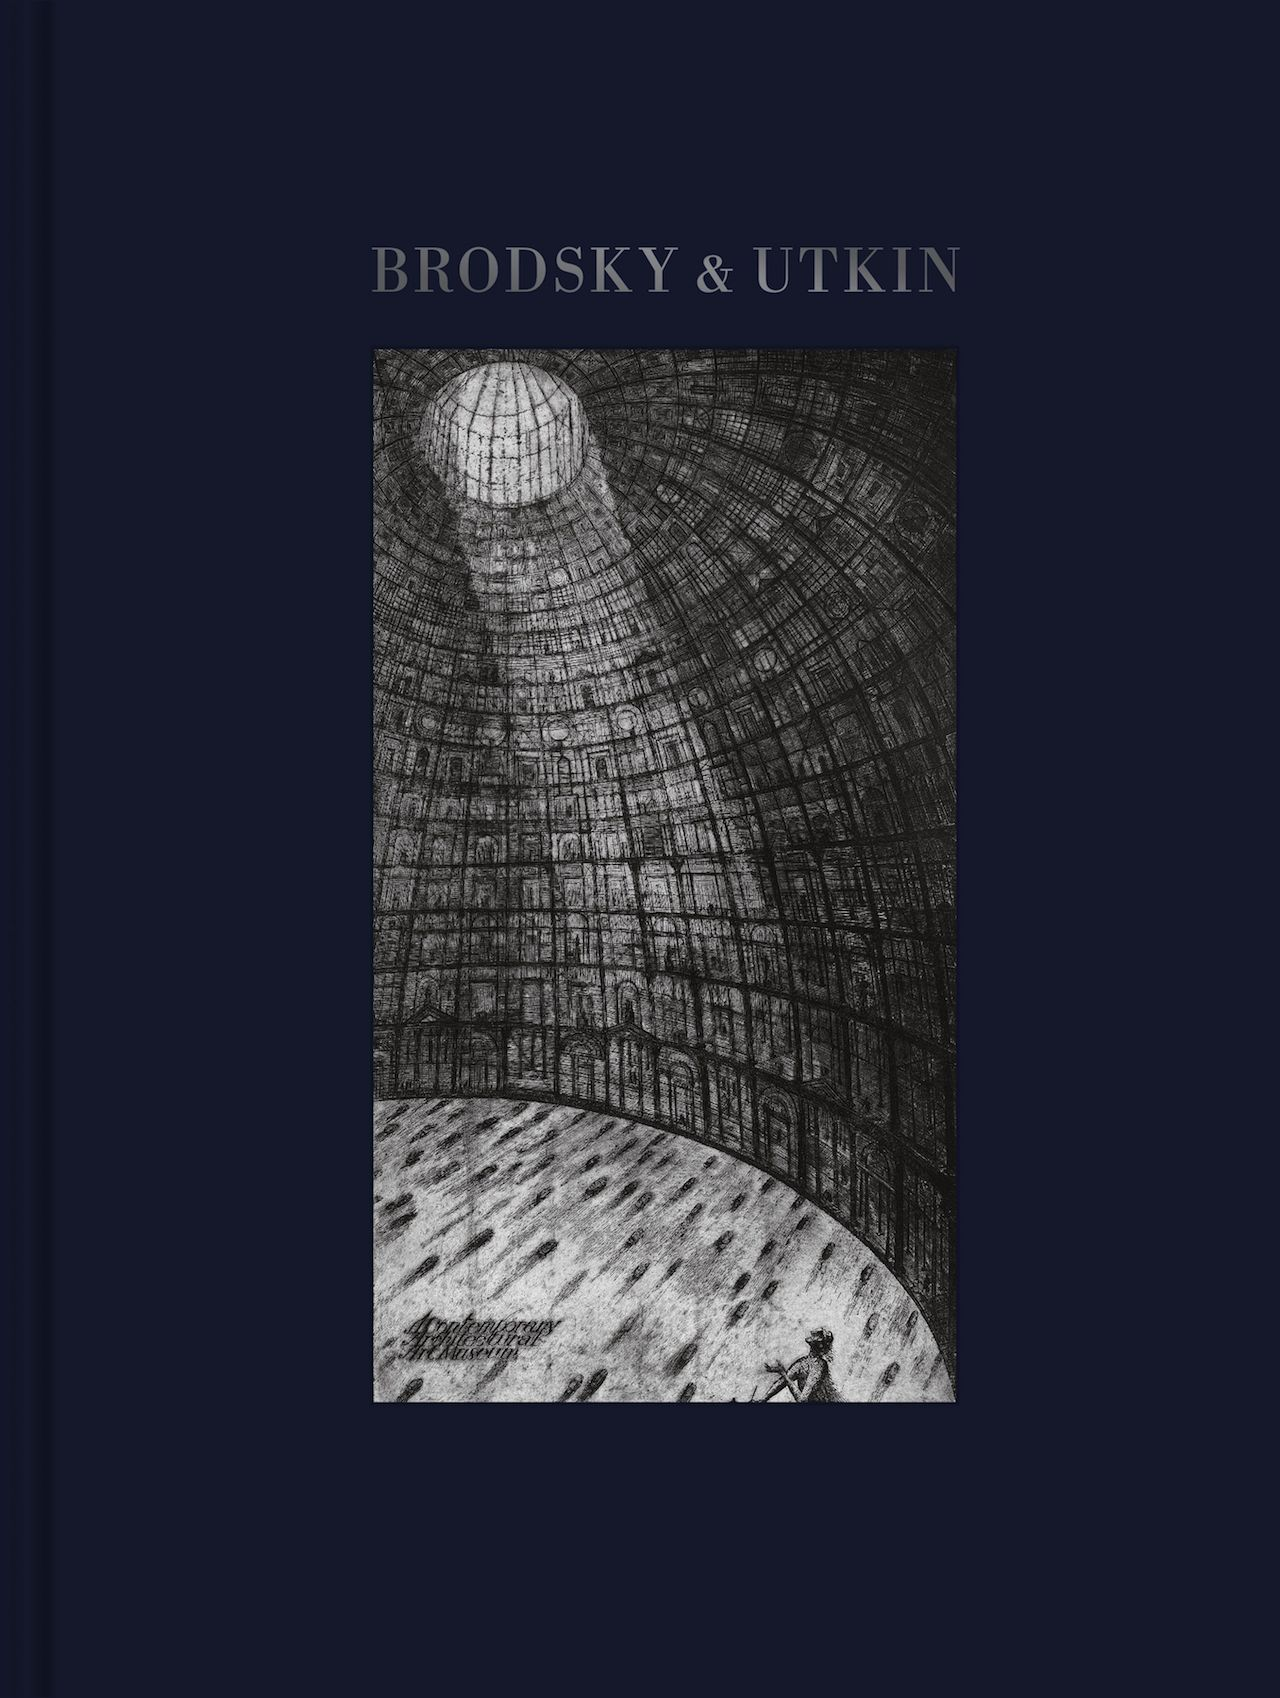 Cover of 'Brodsky & Utkin' (courtesy Princeton Architectural Press)